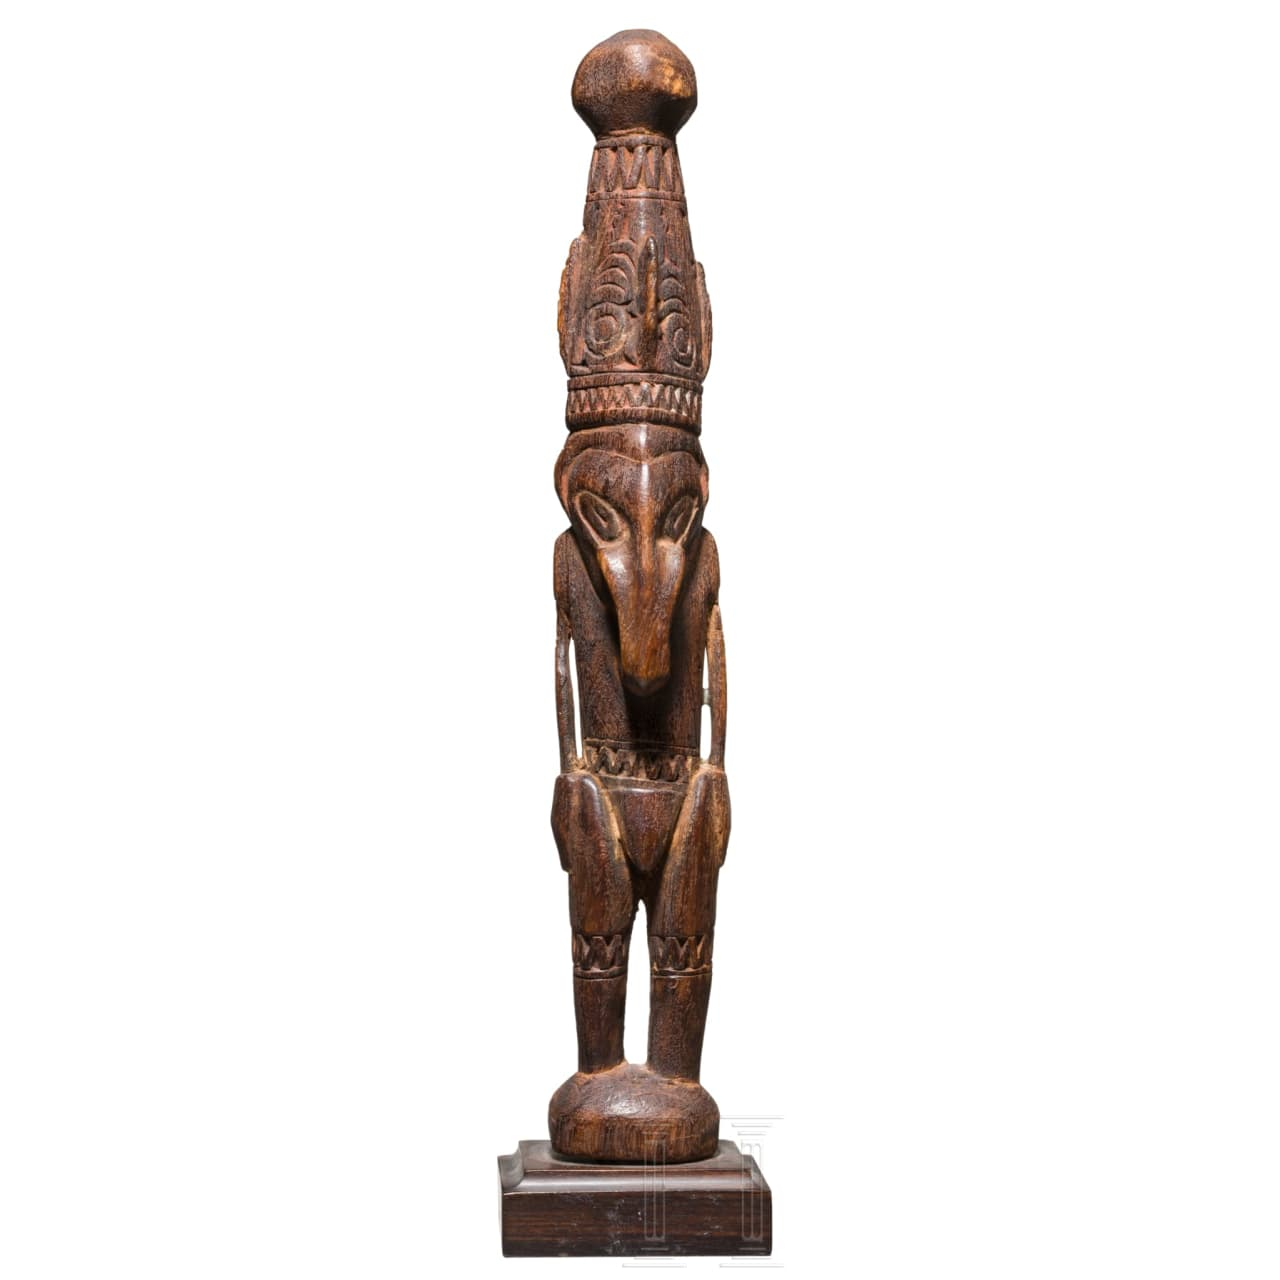 A Papua New Guinean anthropomorphic figure